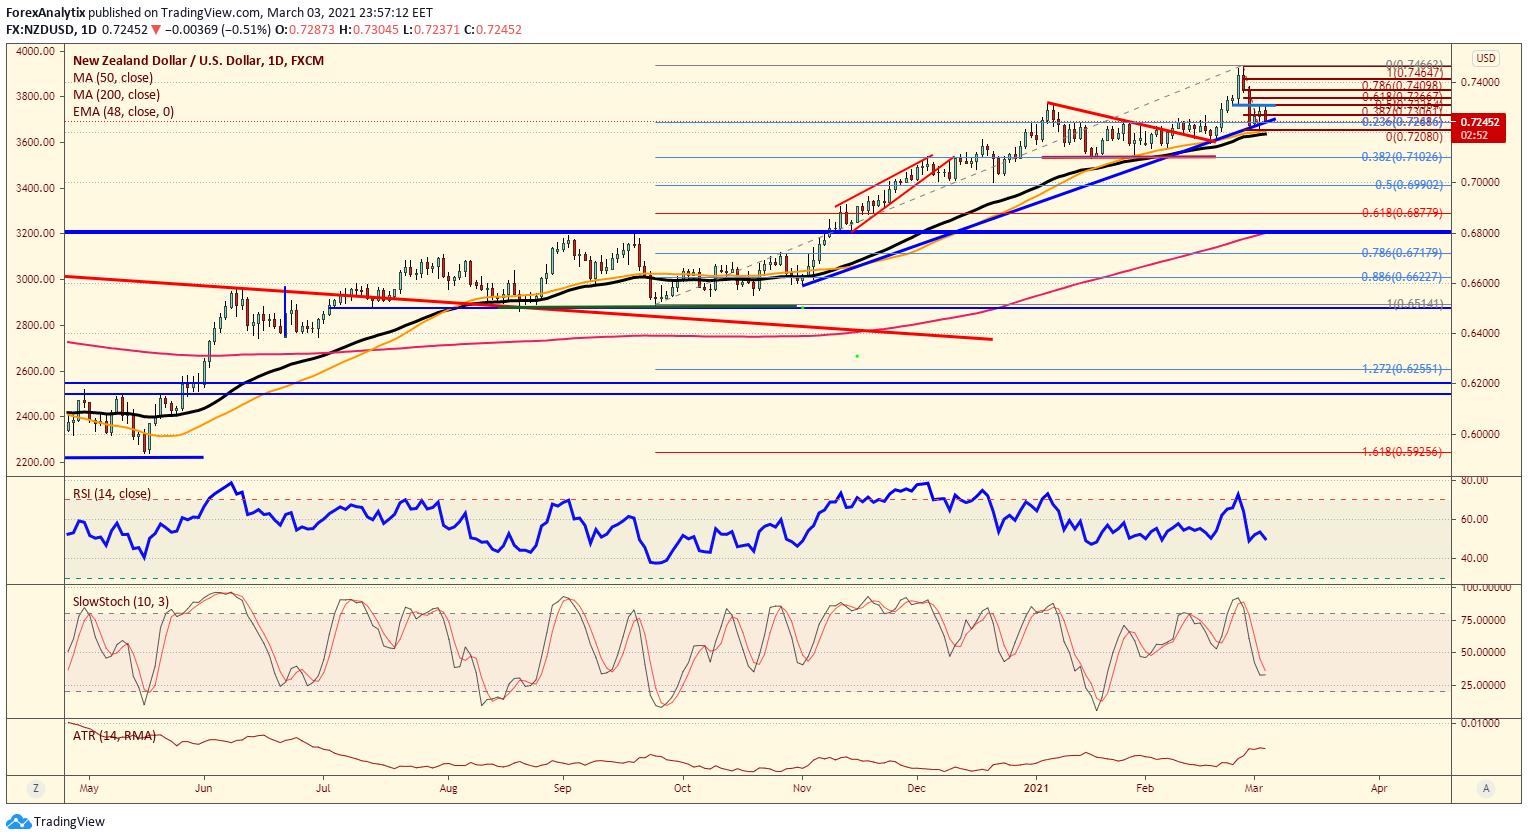 NZD/USD Daily Chart.